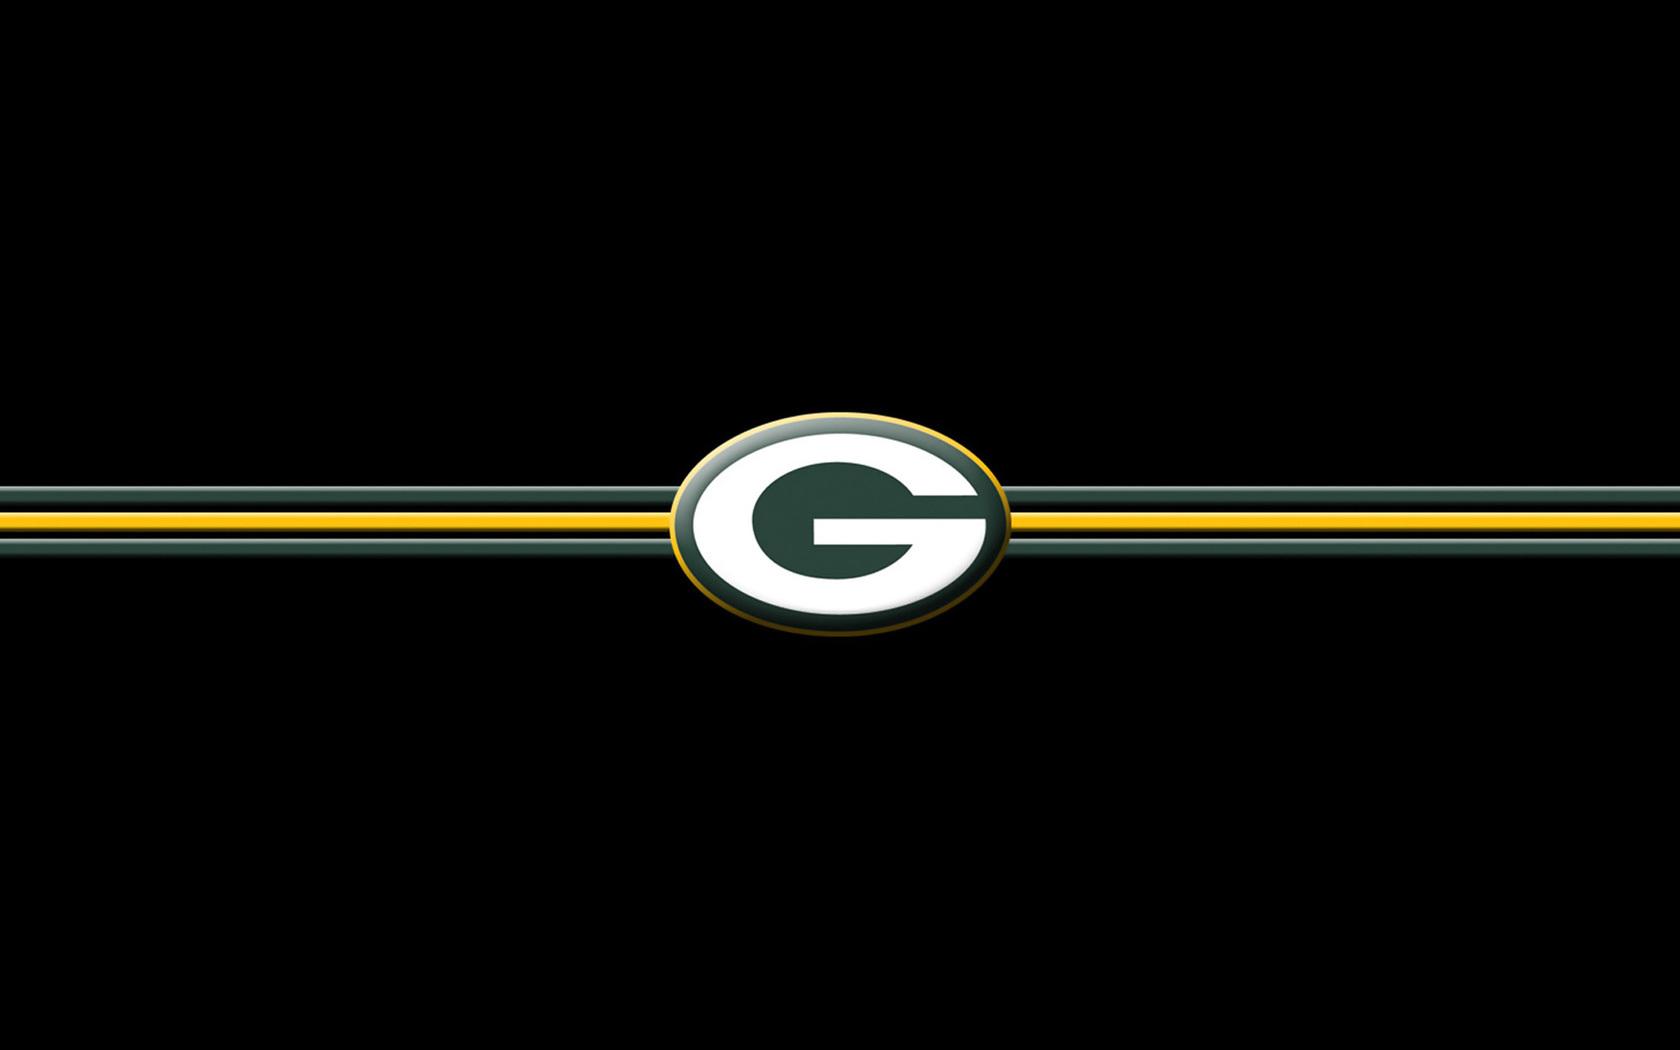 Green Bay Packers wallpaper 35958 1680x1050